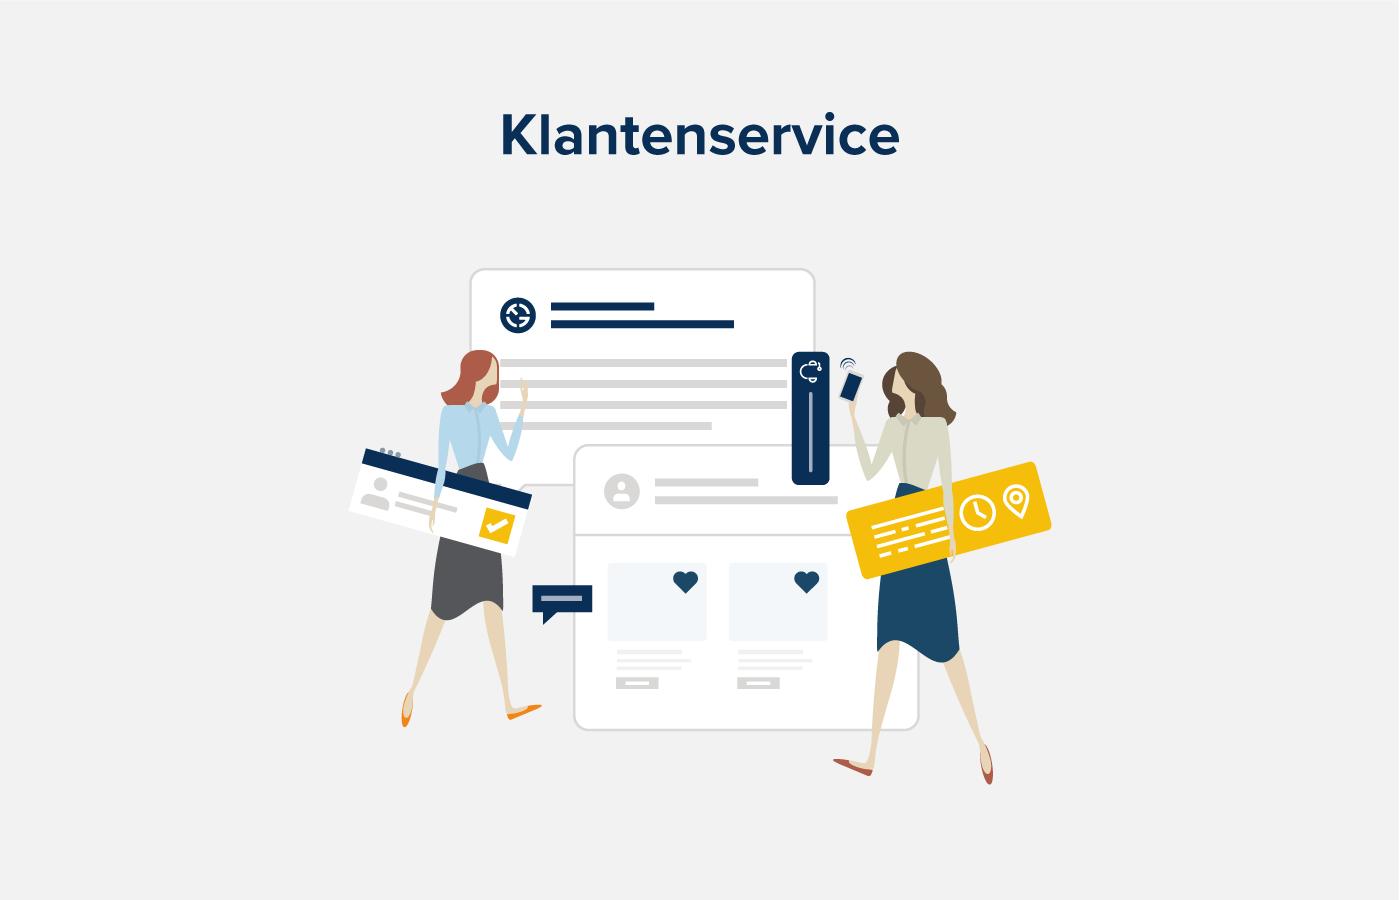 illustratie klantenservice